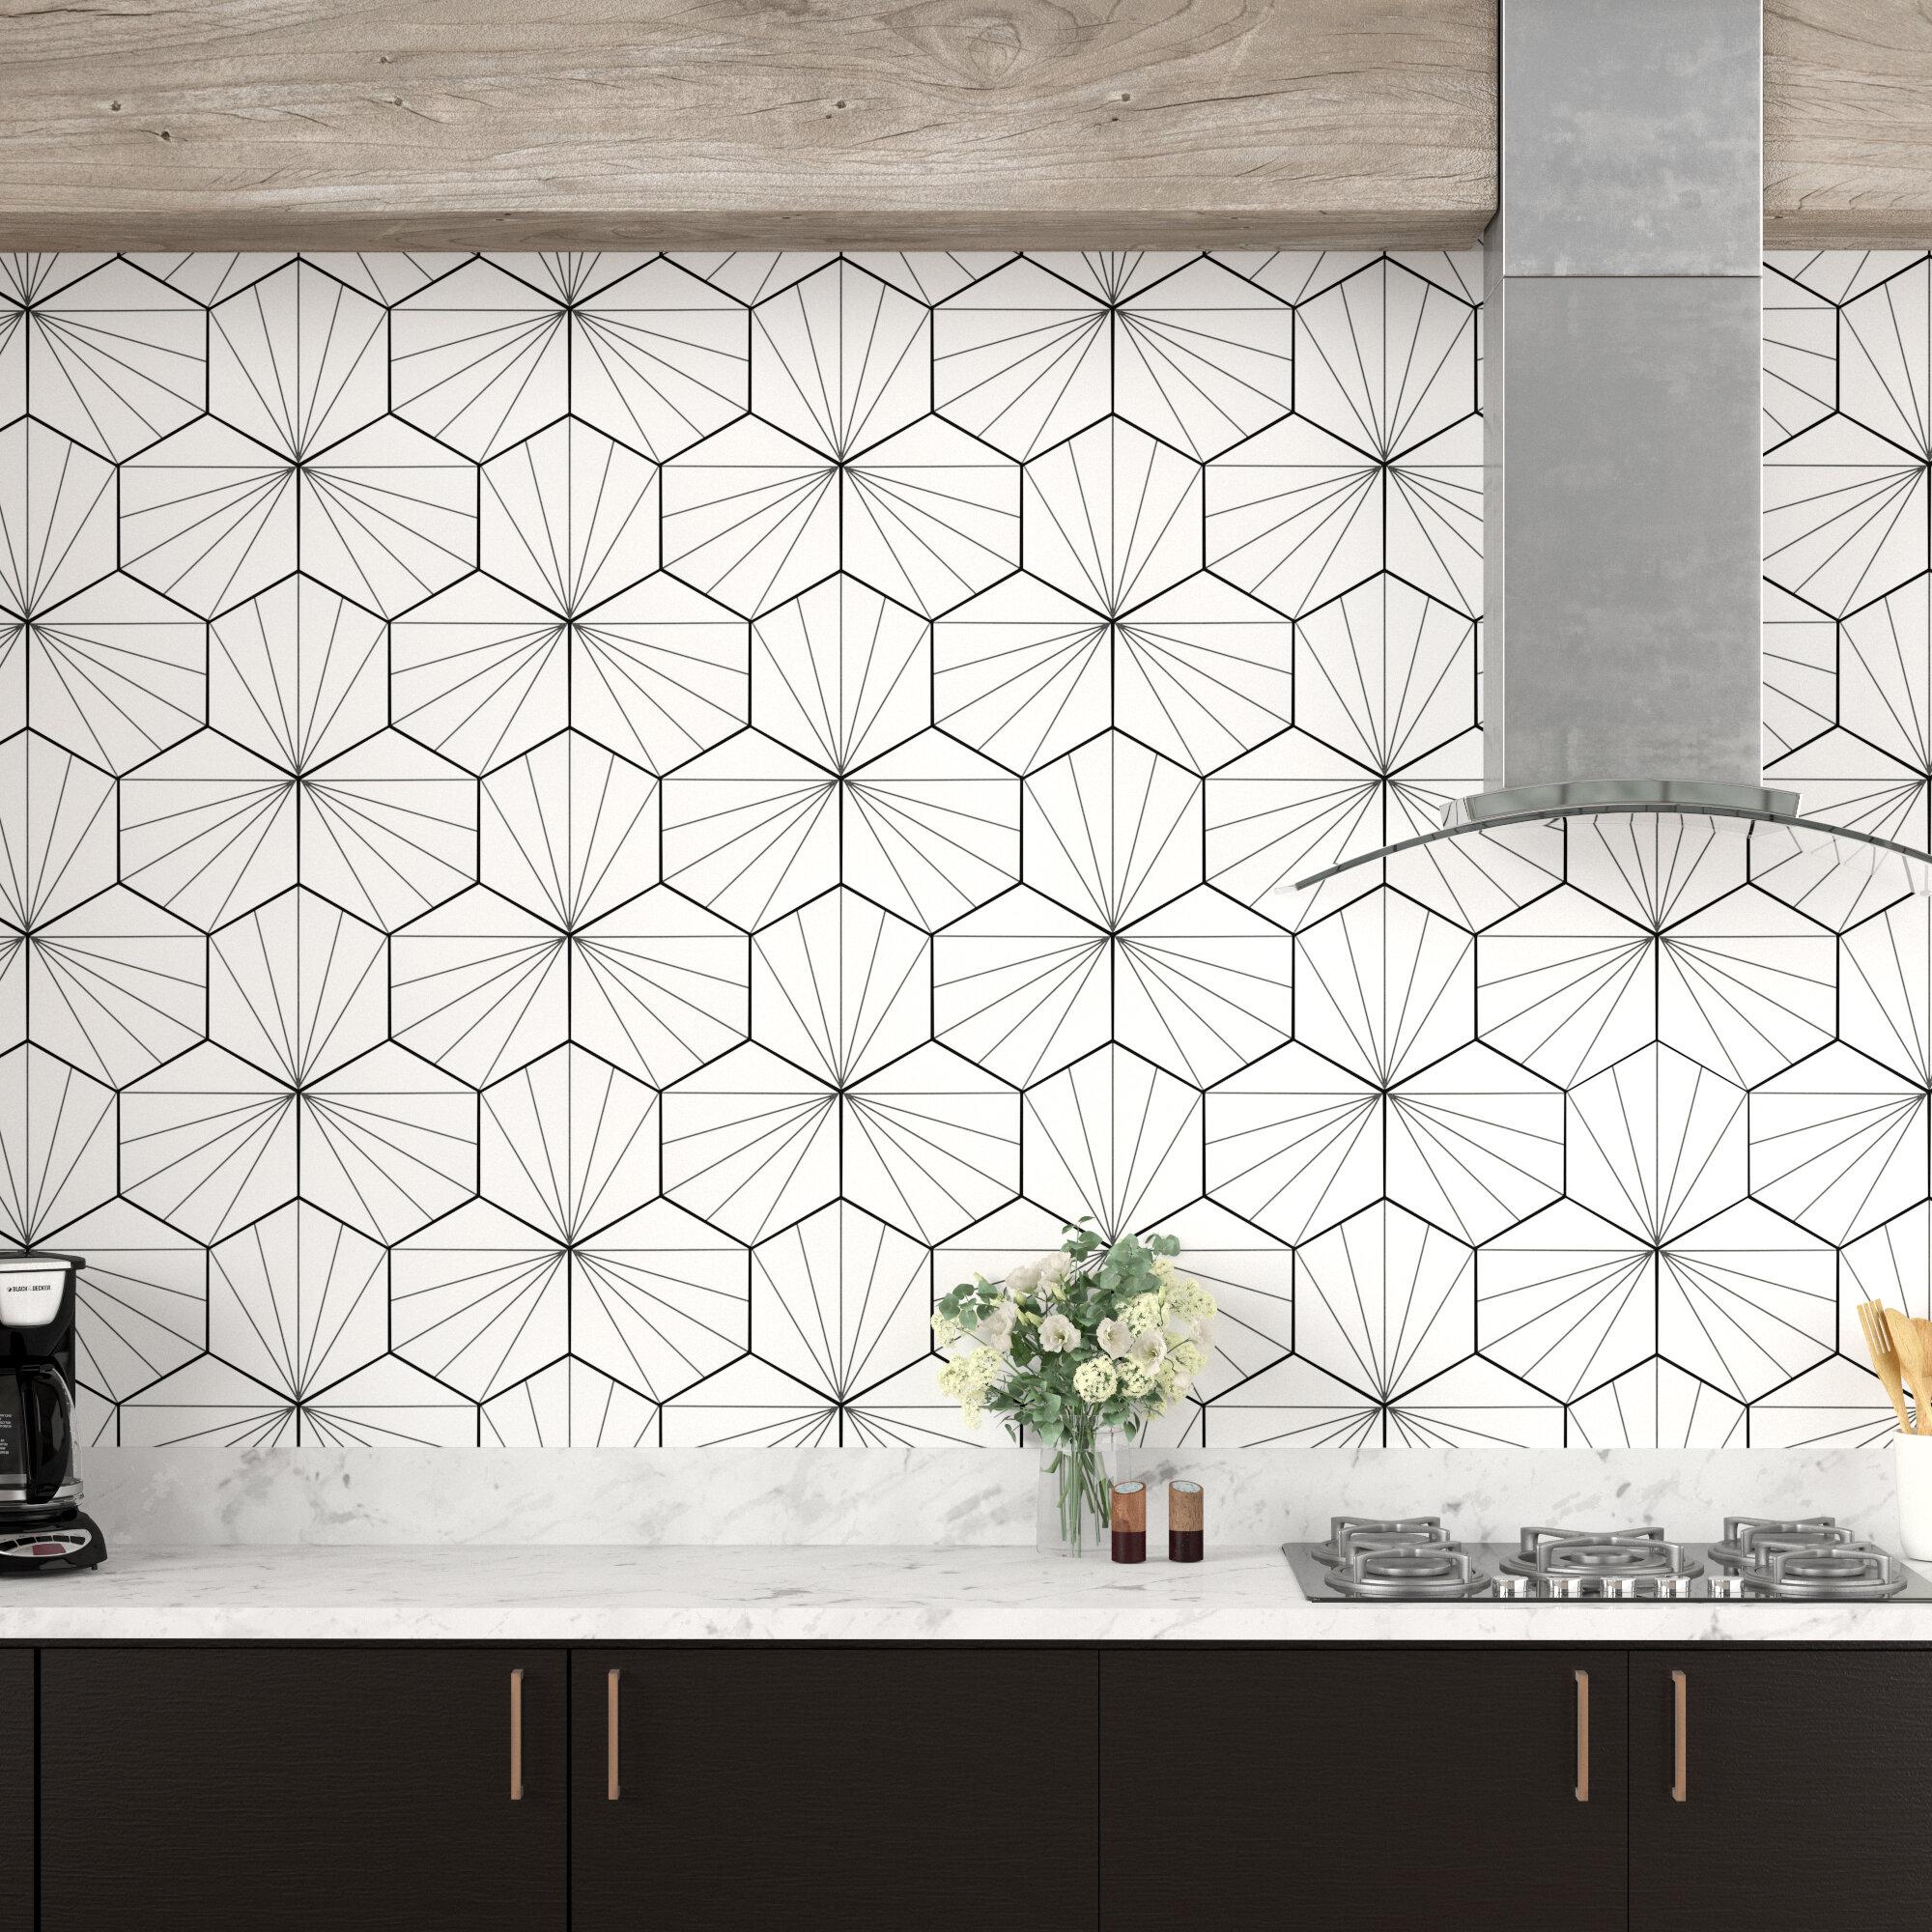 Elitetile Misha 9 X 10 Porcelain Patterned Wall Floor Tile Reviews Wayfair